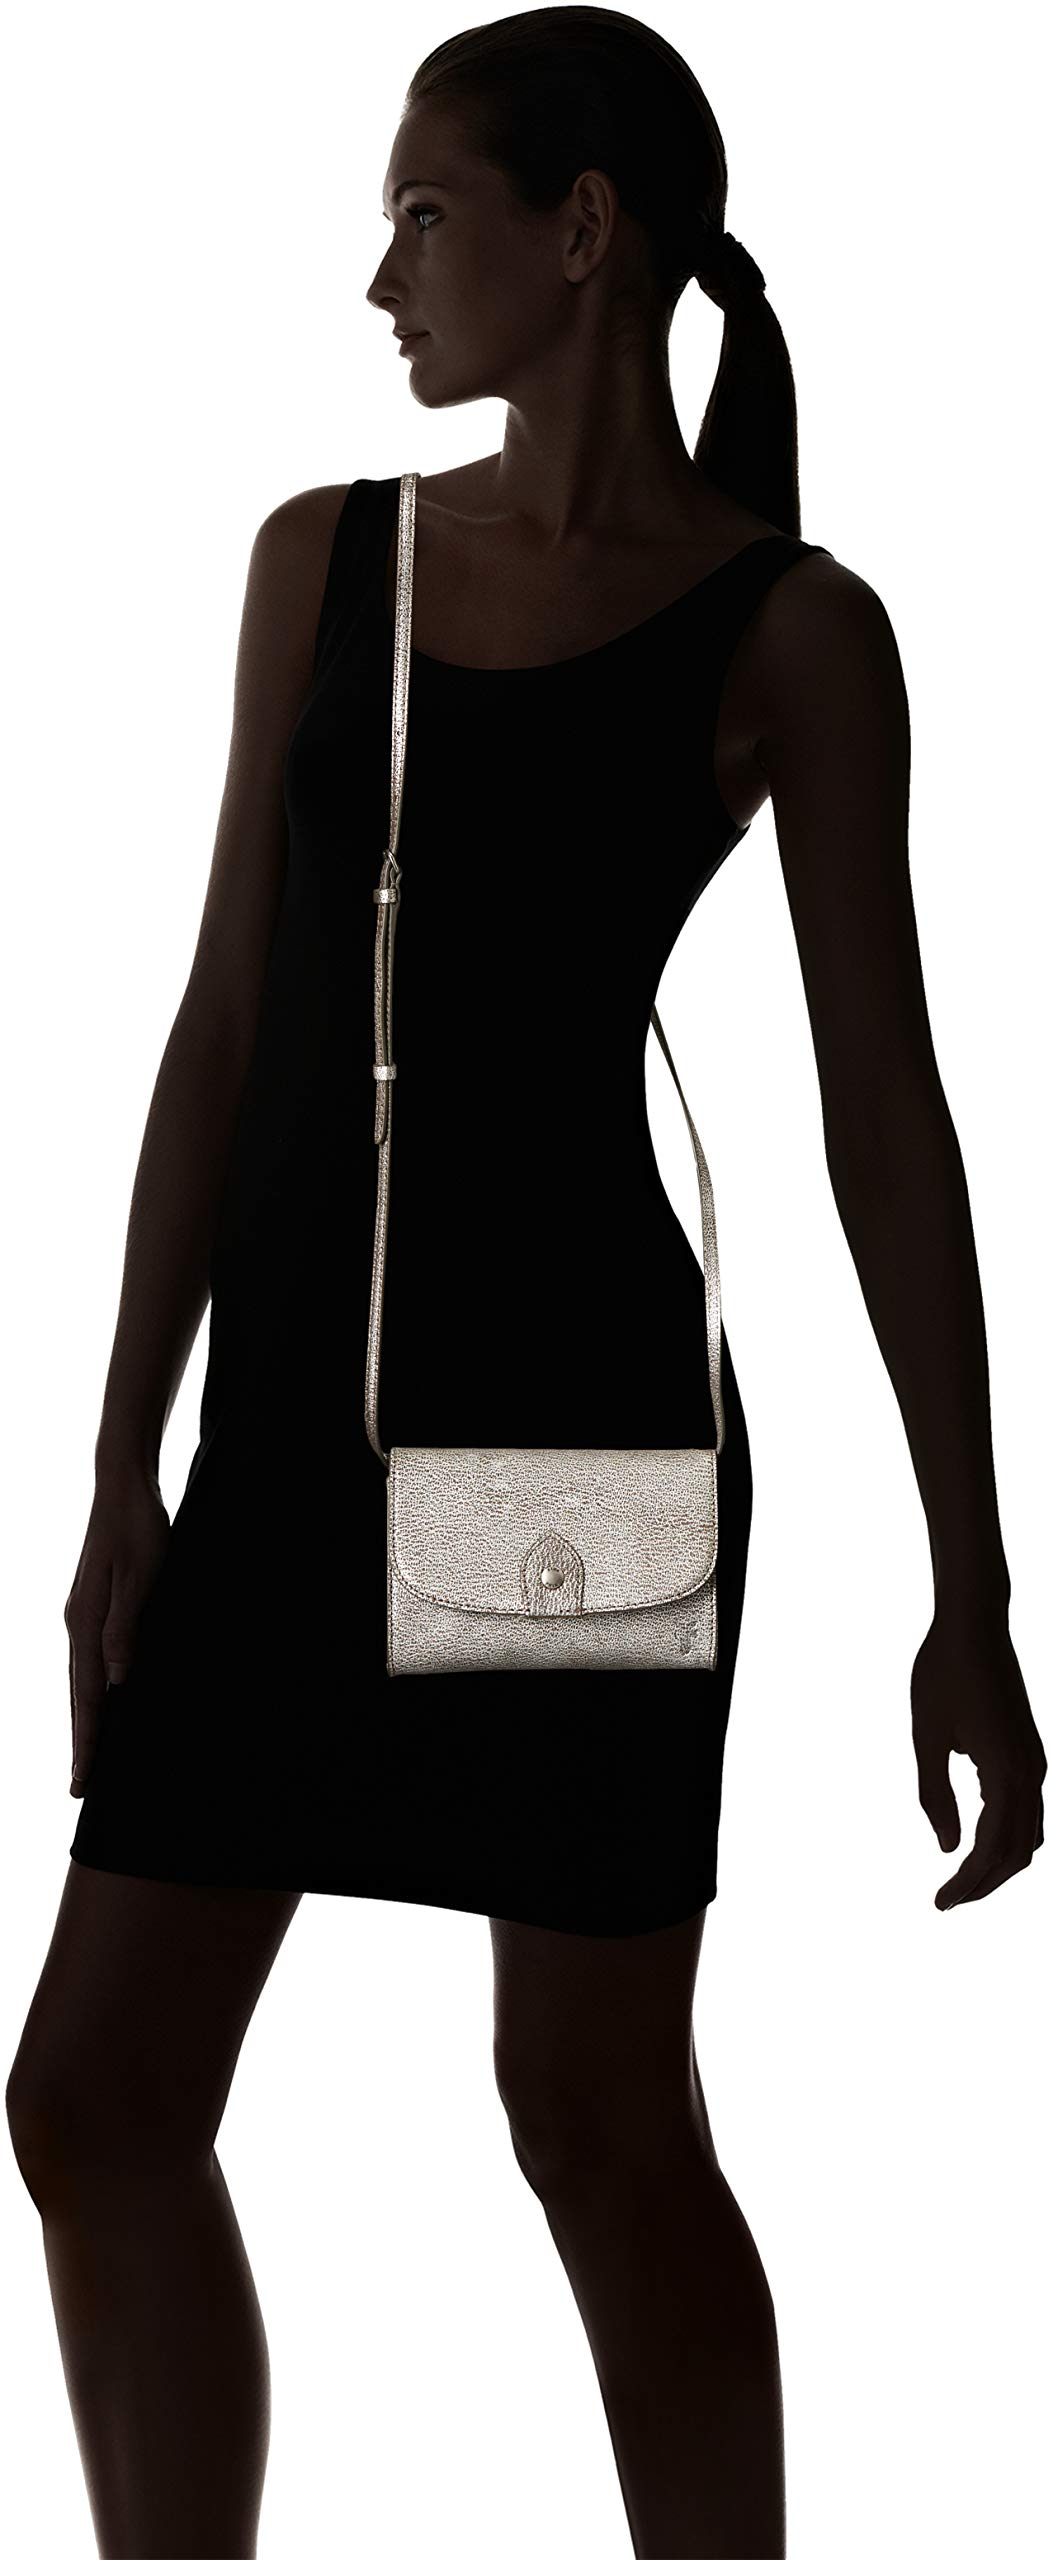 FRYE Melissa Wallet Crossbody Clutch Leather Bag, silver by FRYE (Image #7)